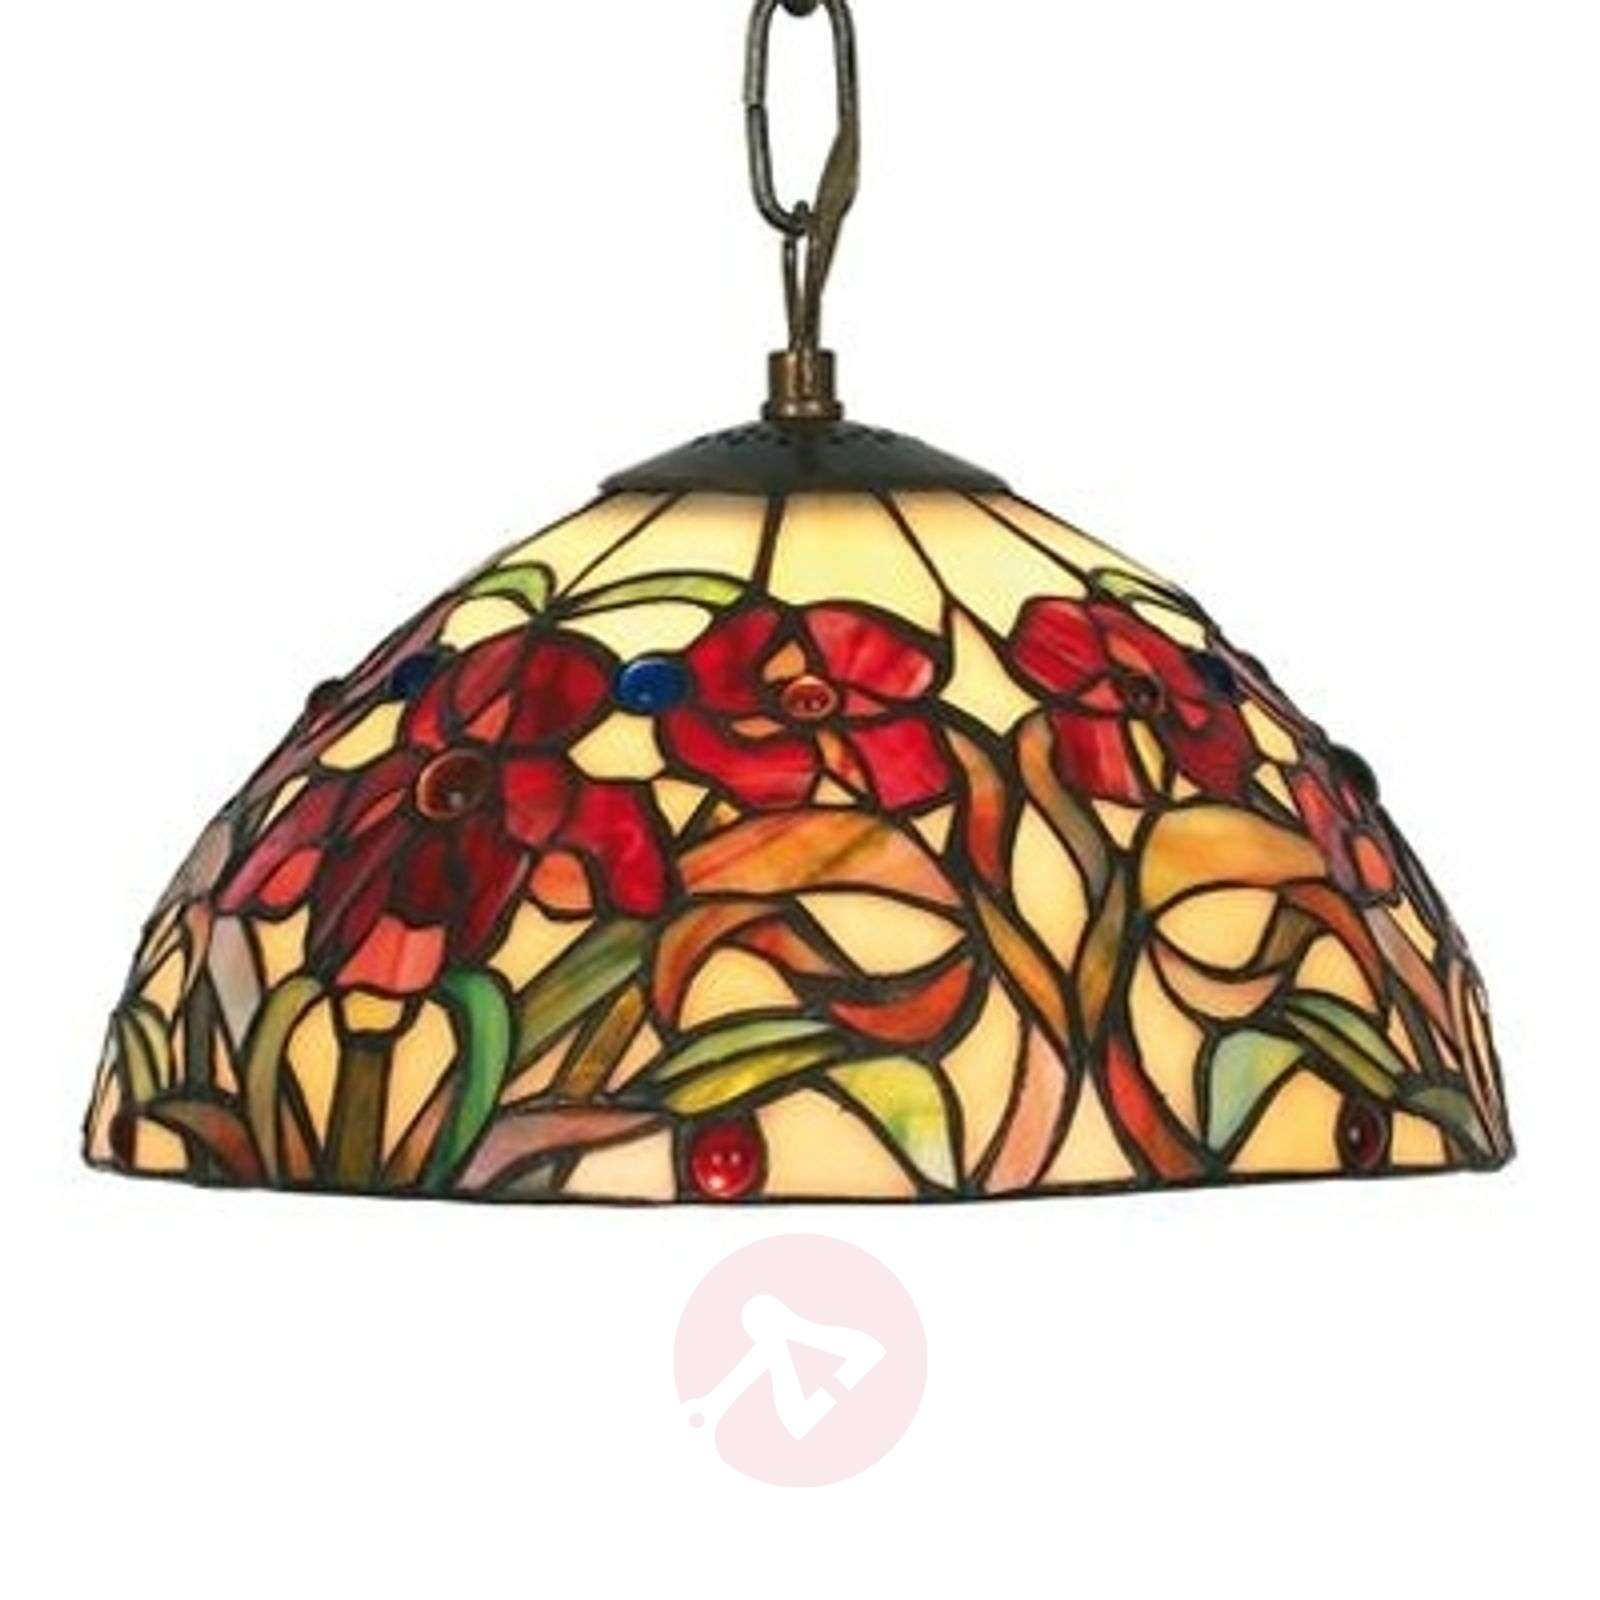 Beautiful hanging light Eline in Tiffany style-1032168-01